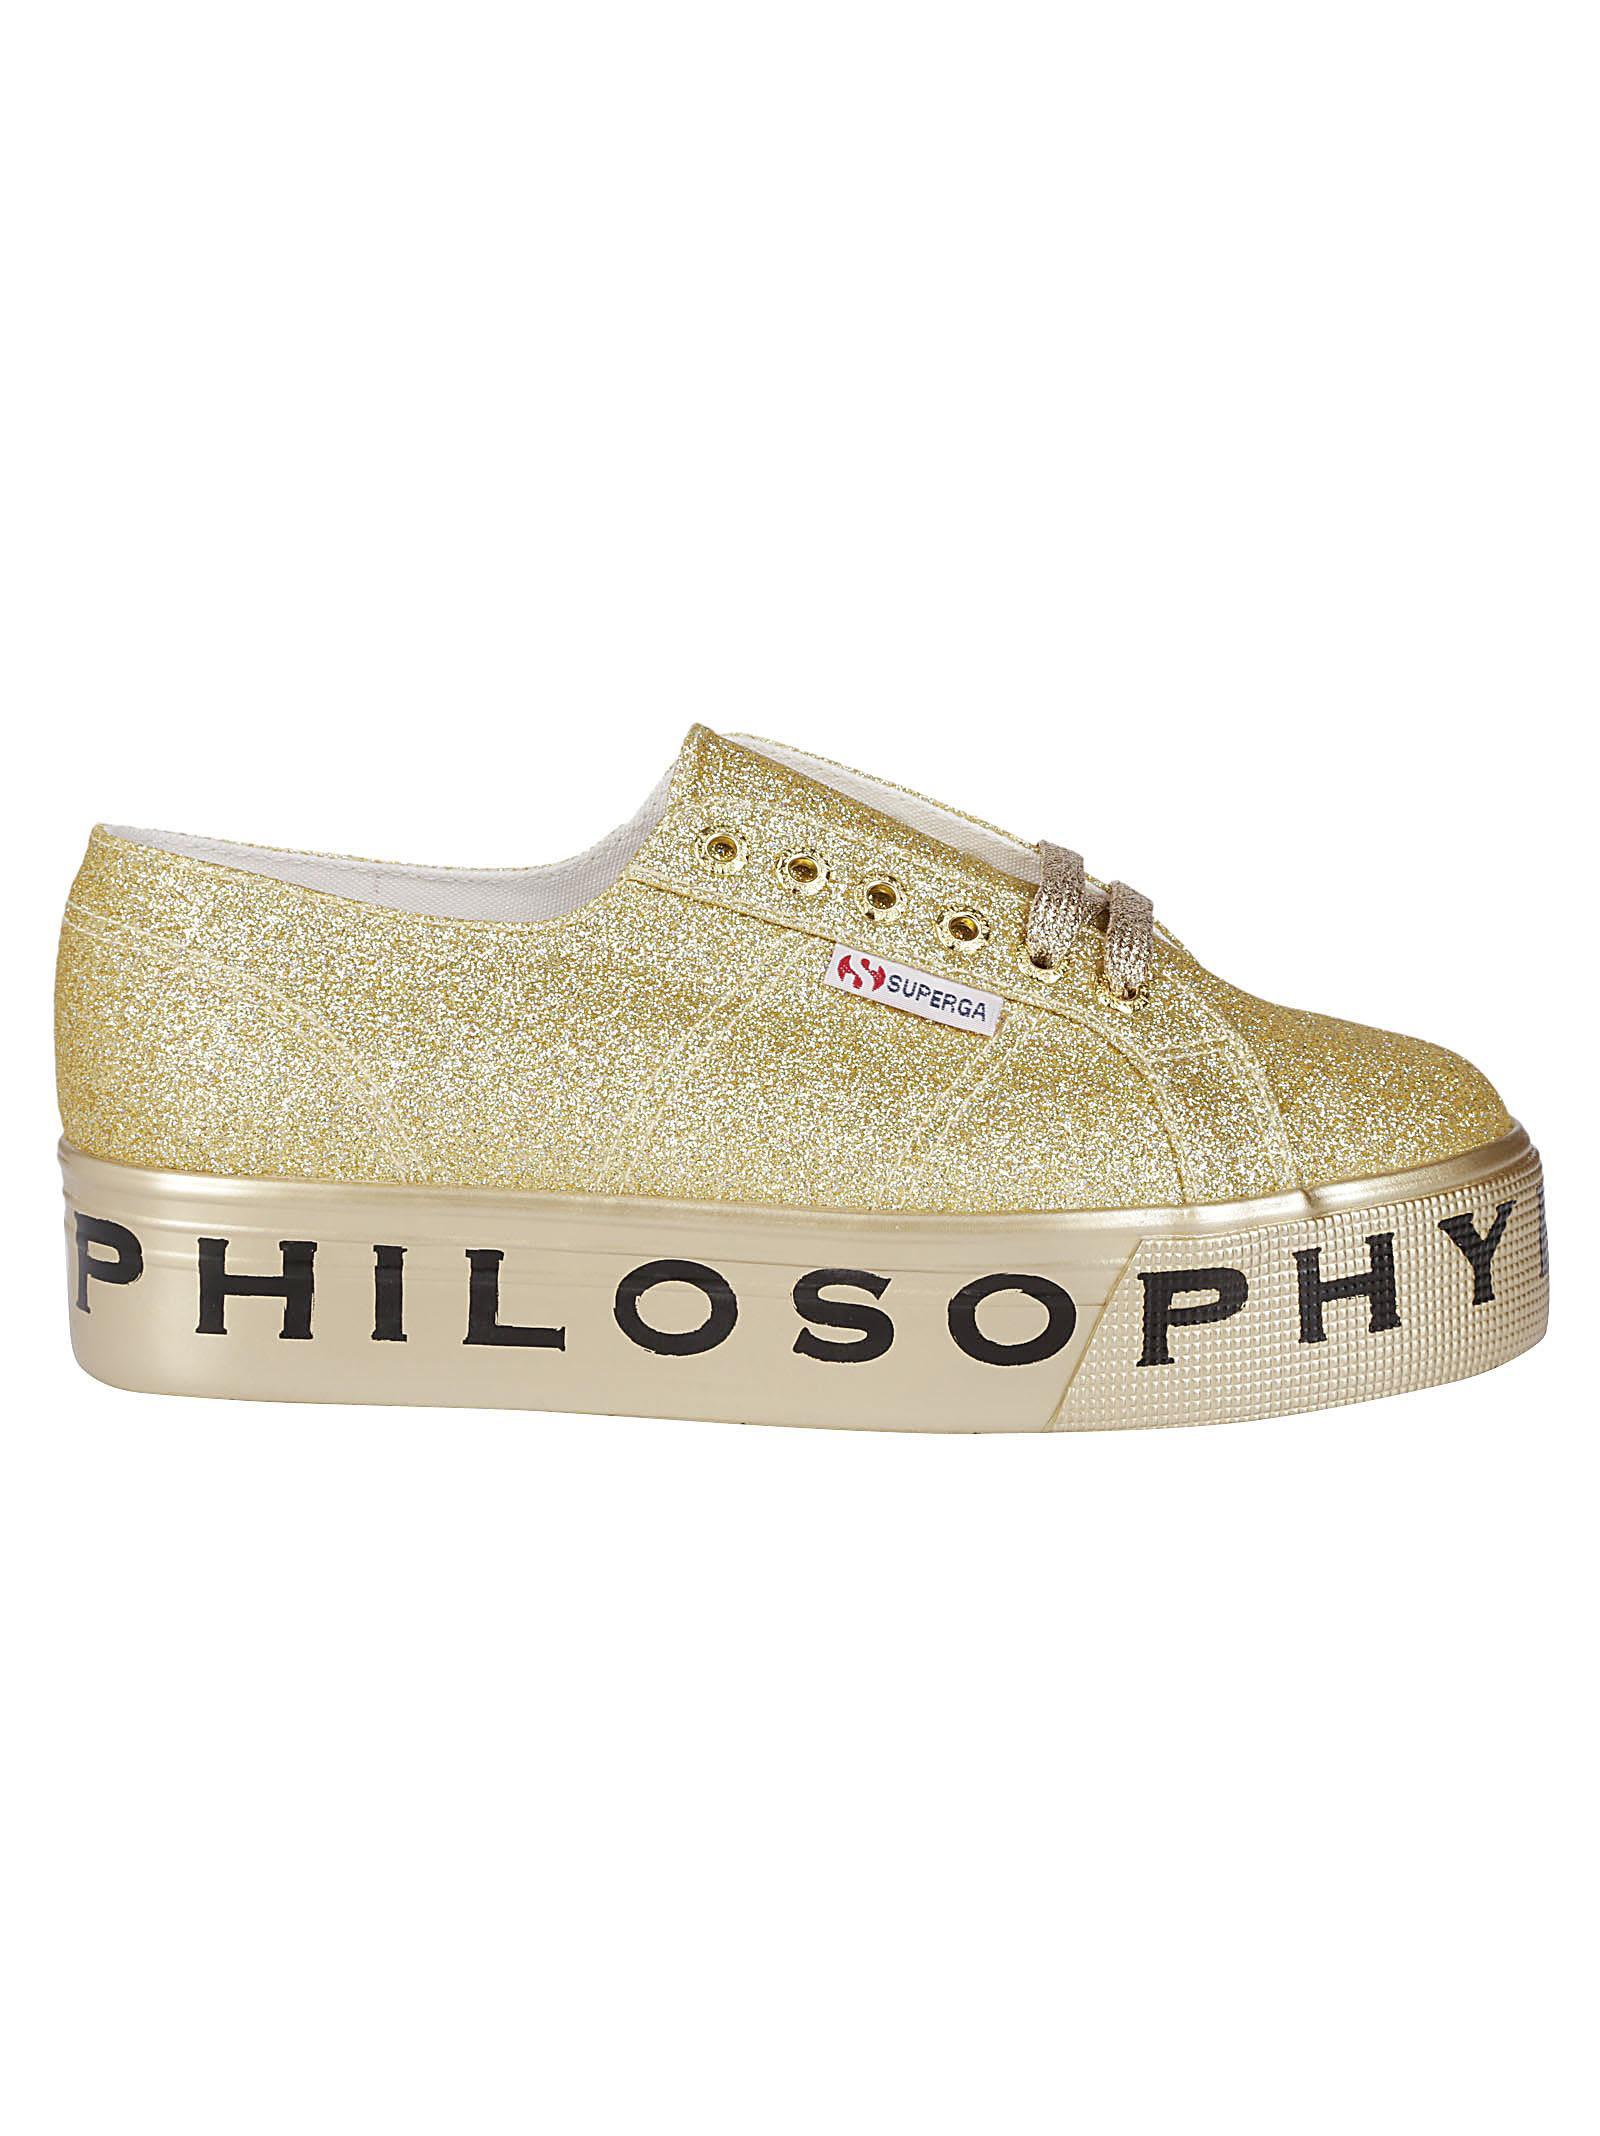 Superga Serafini Sneakers Glitter Platform Di Lorenzo Philosophy roeCdxB